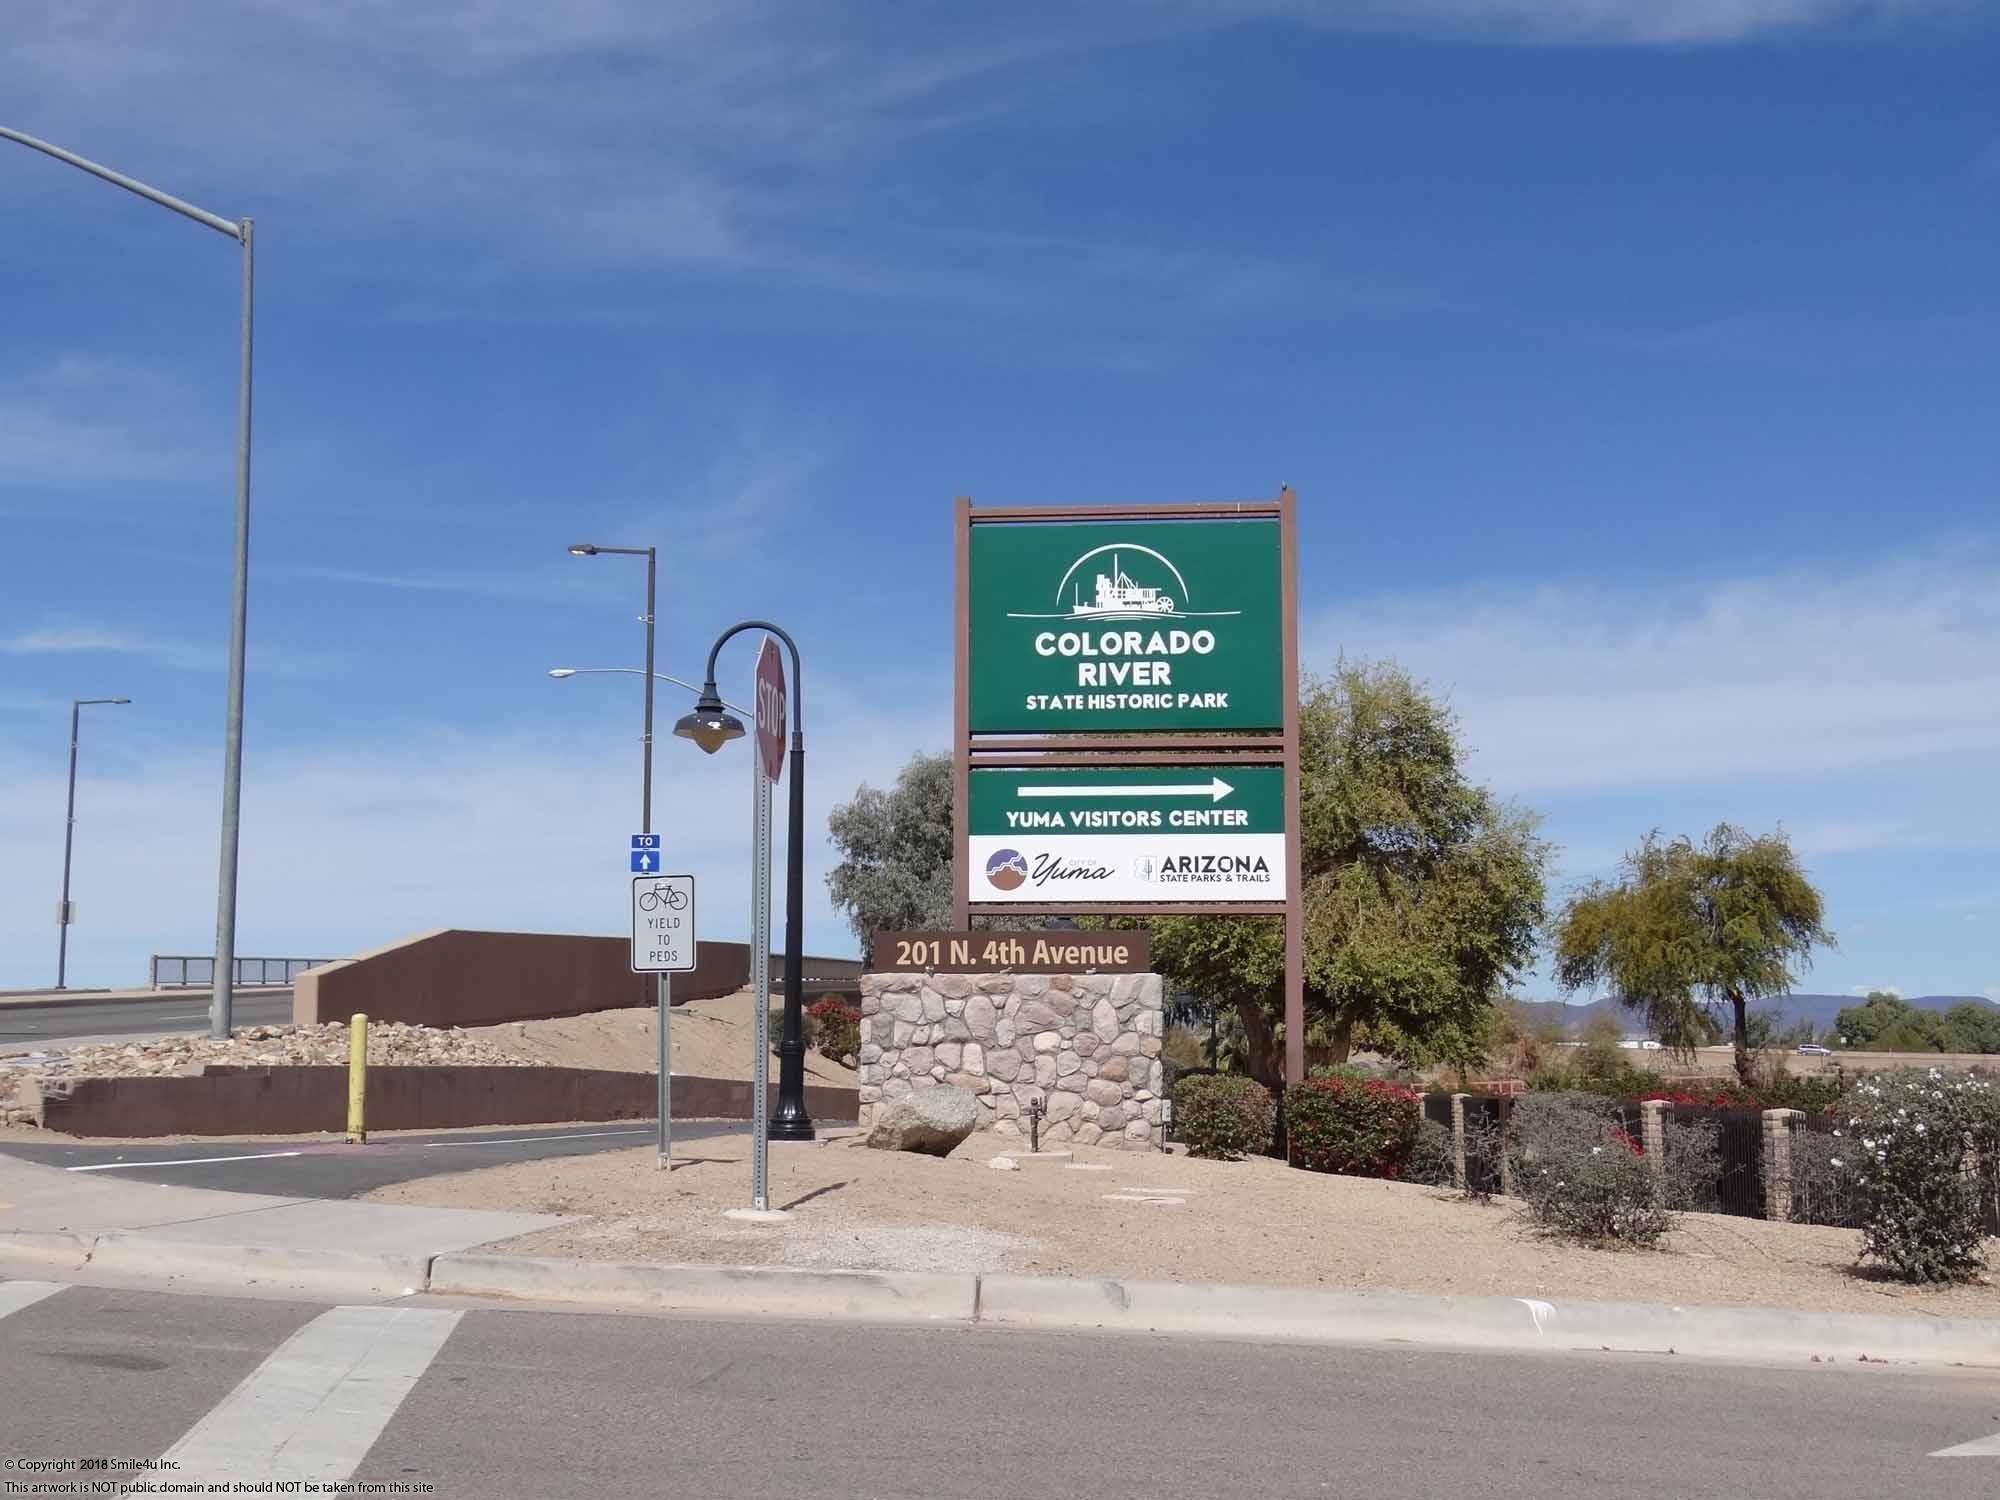 2 acres land in Southwest Arizona | Smile4uinc com